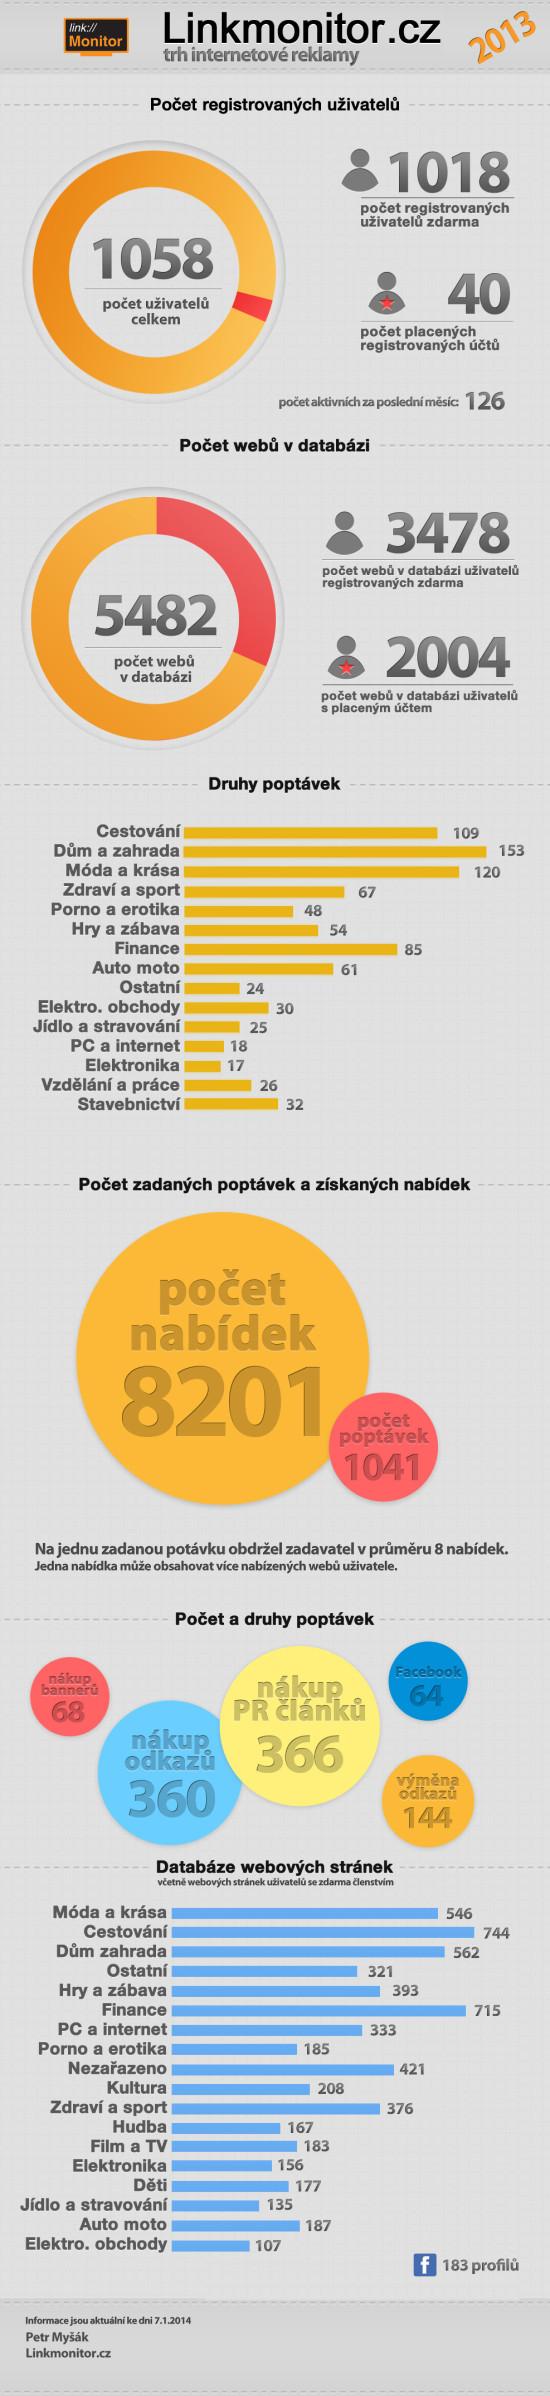 linkmonitor - infografika